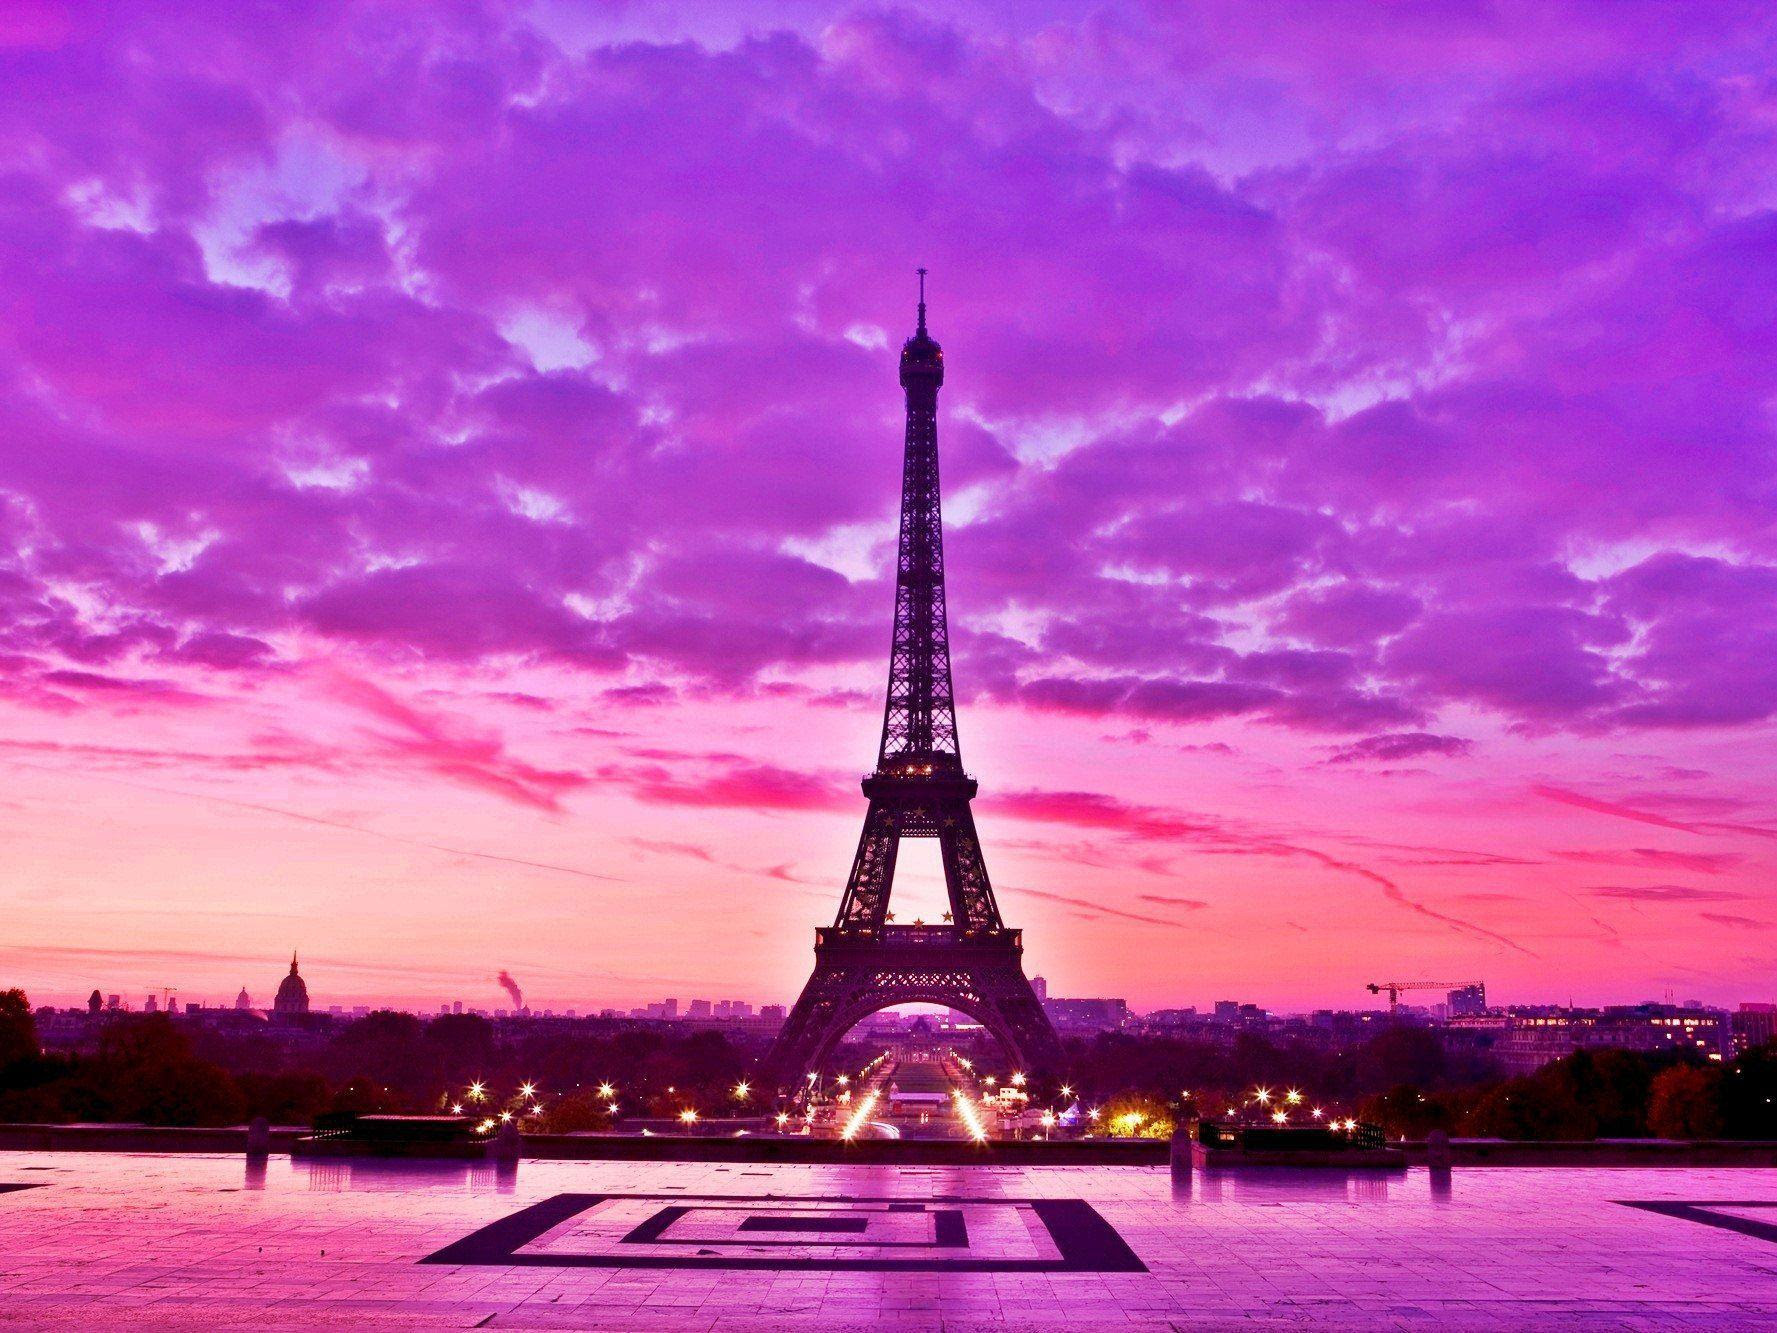 Eiffel Tower Desktop Wallpapers  Wallpaper Cave